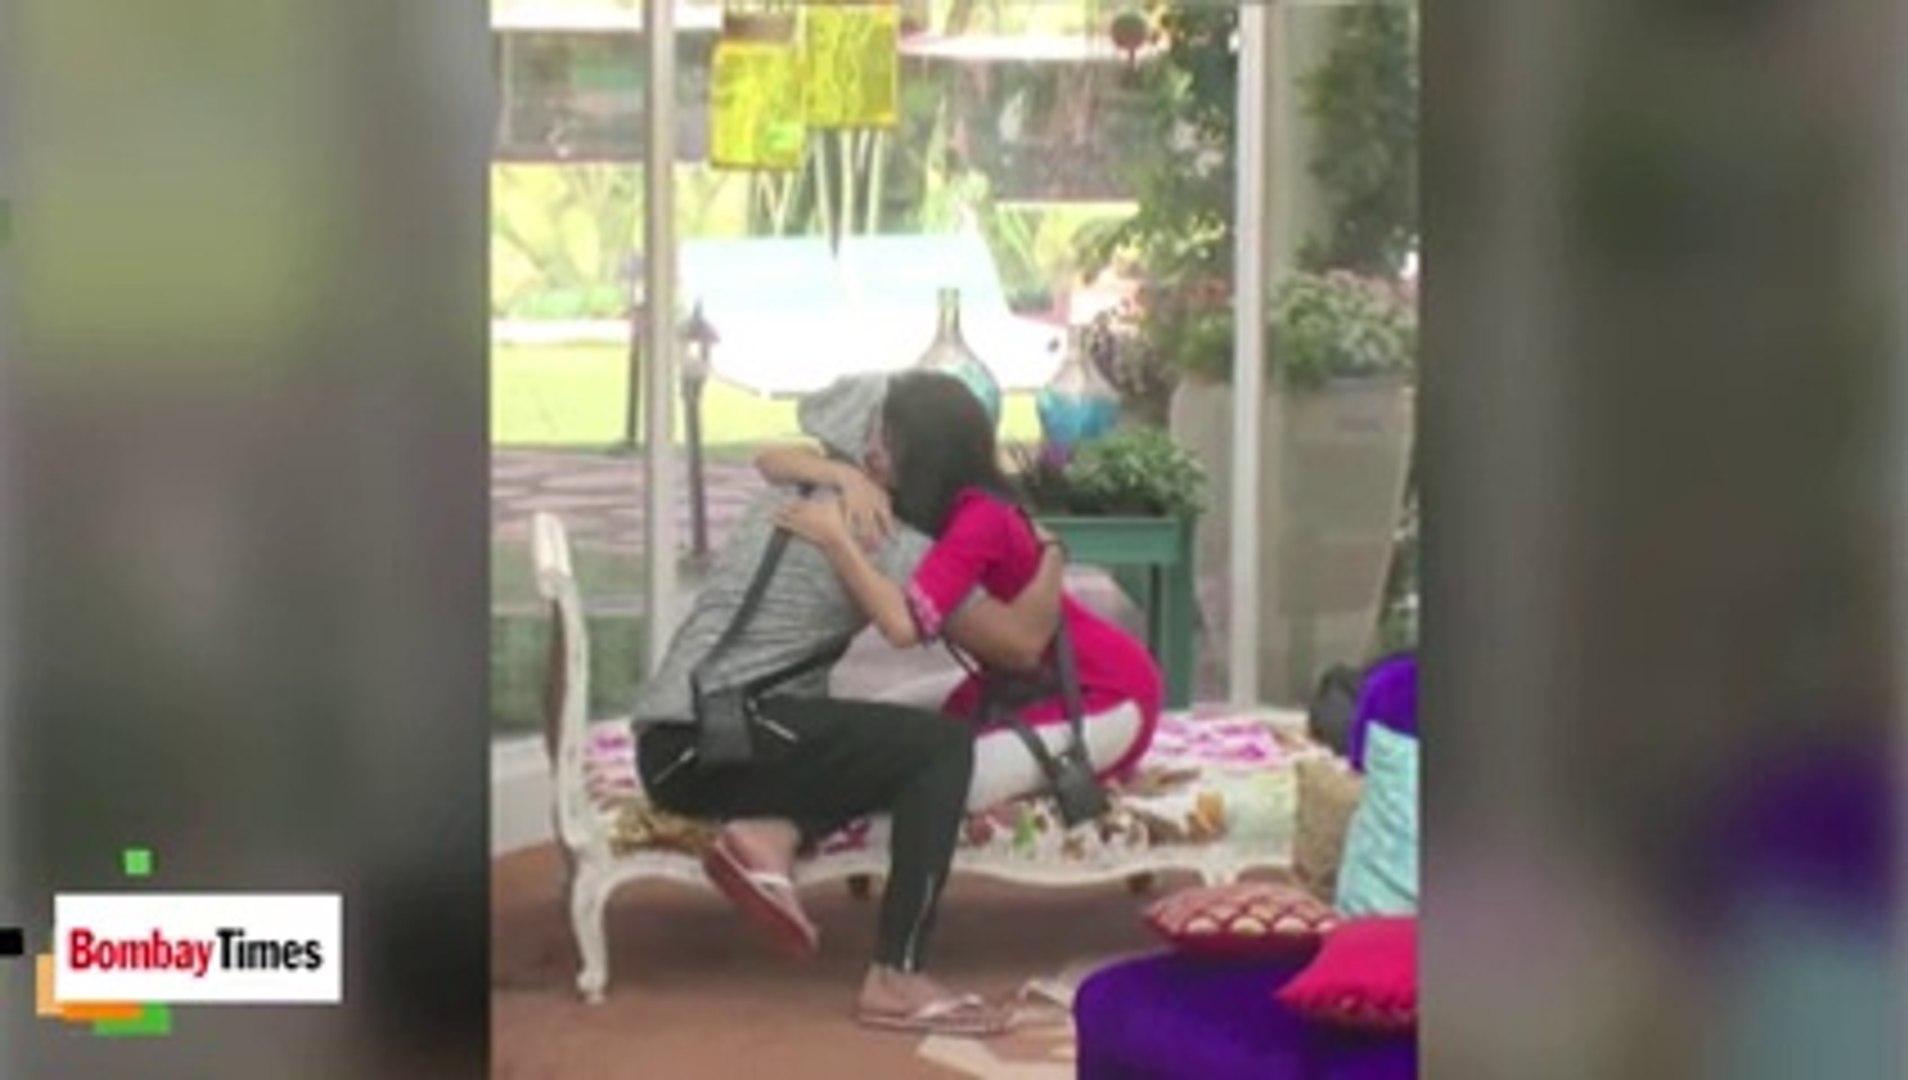 Bigg Boss 9 _ Day 66 _ Episode 66 - 16th Dec 2015 _ Prince Chooses Yuvika Chaudhary Over Nora Fatehi